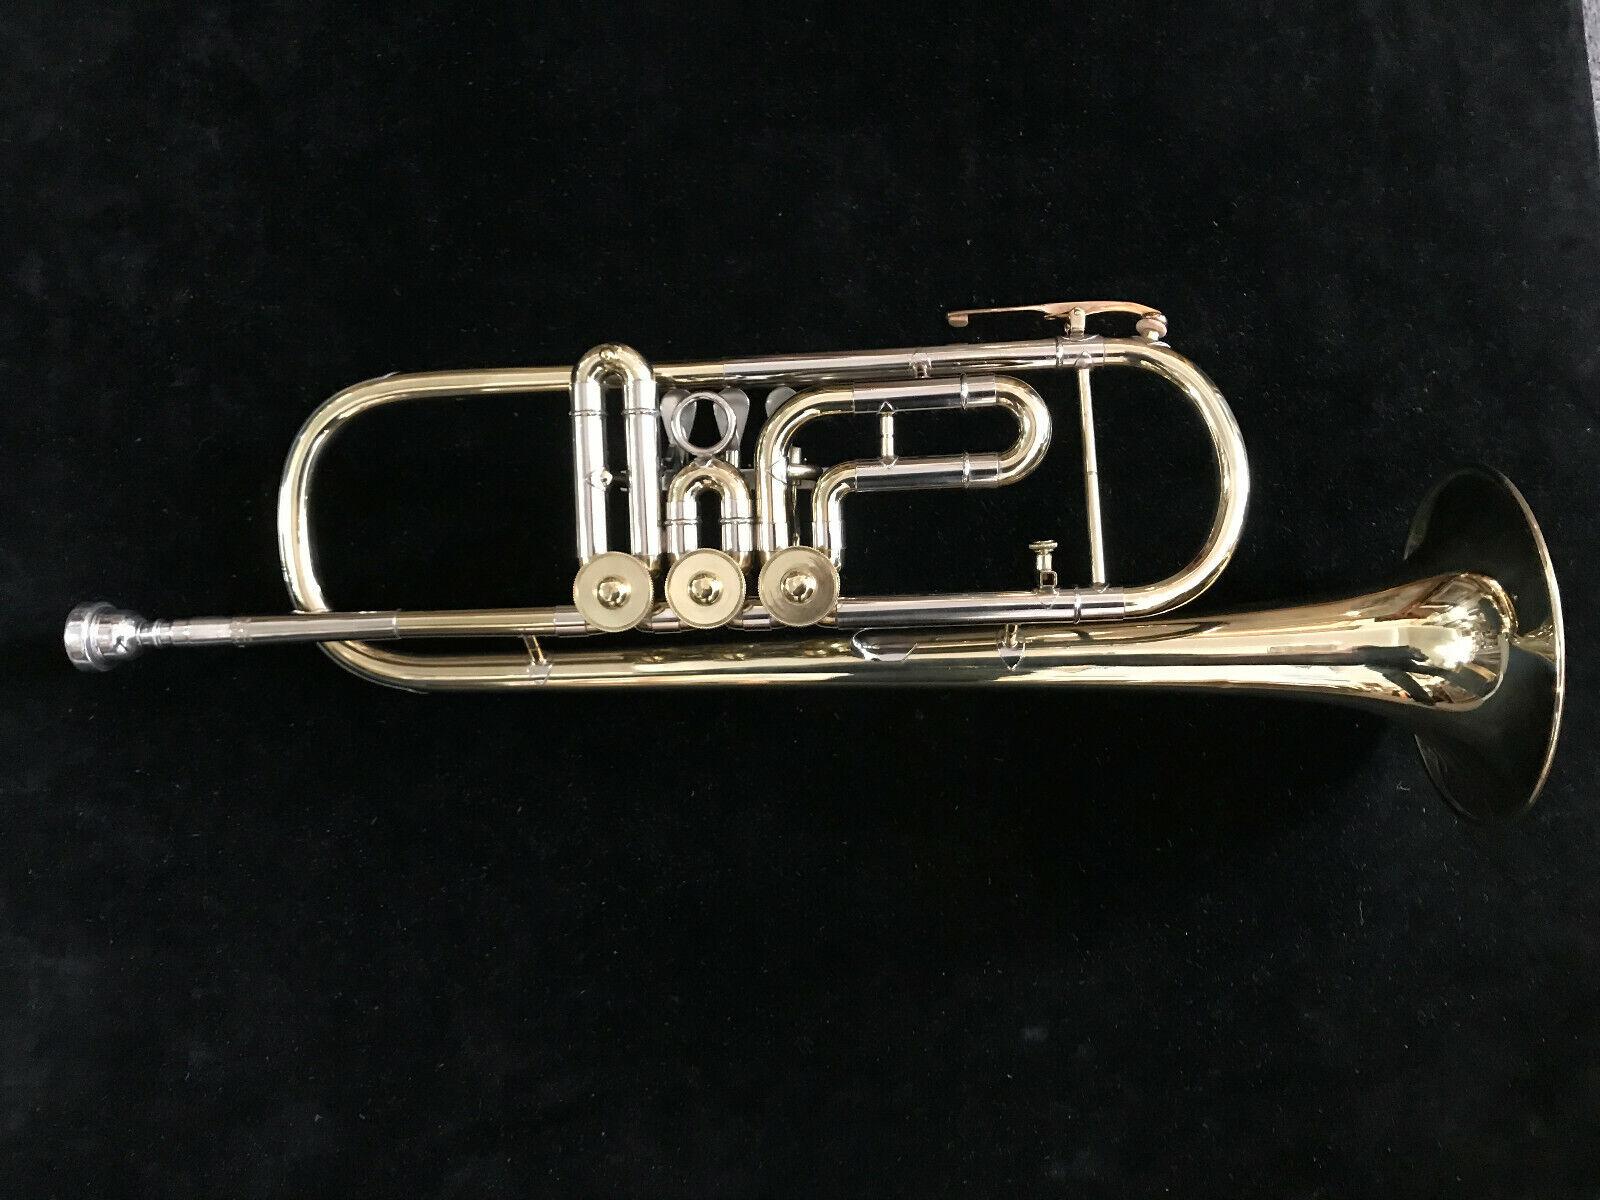 Konzert-Trompete CTR 501, Cerveny fachmännisch überholt, wie neu